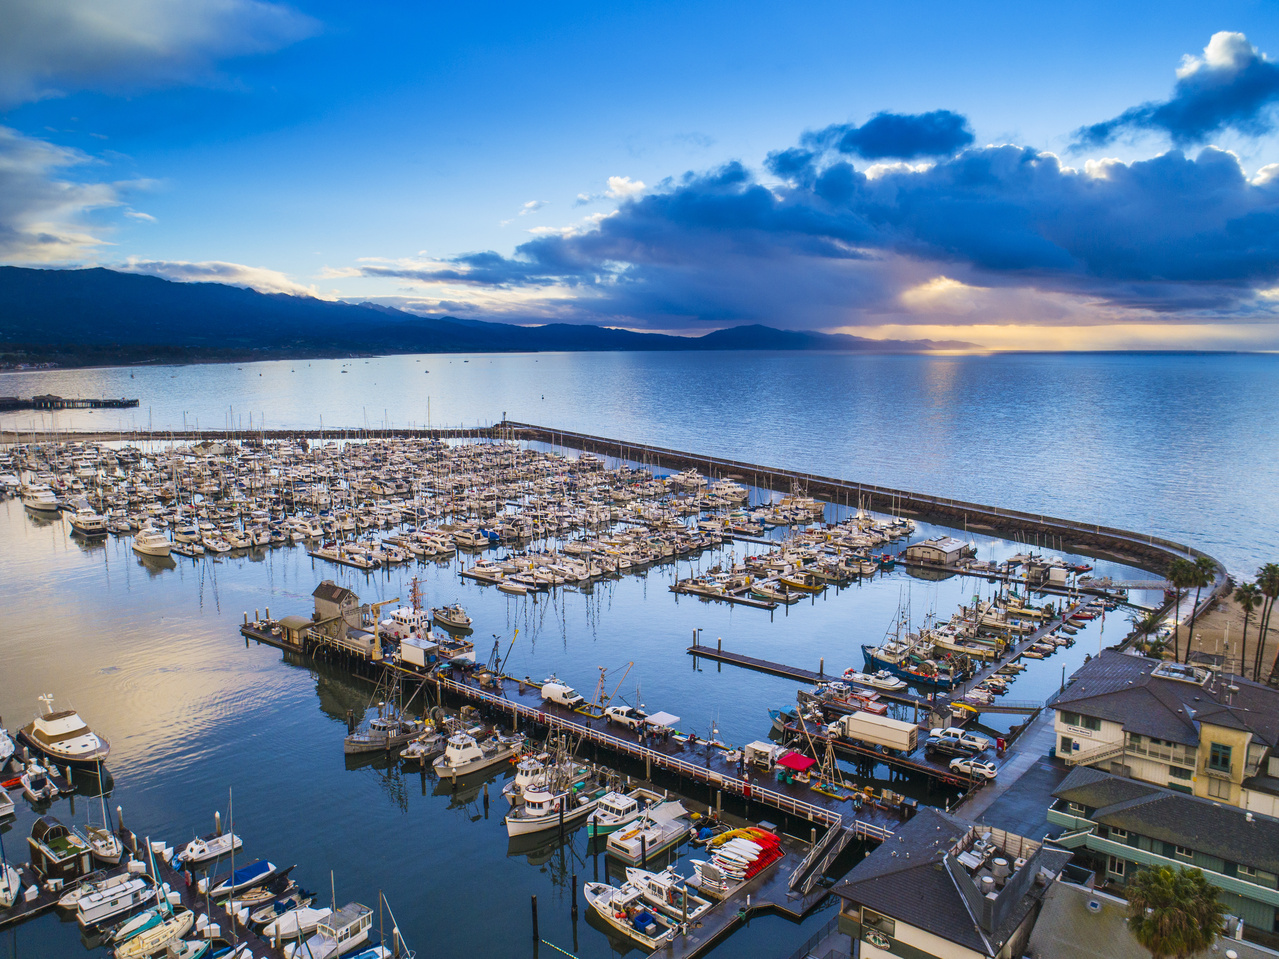 Aerial image of sunrise over the harbor, Santa Barbara, California. Credit: Getty Images.